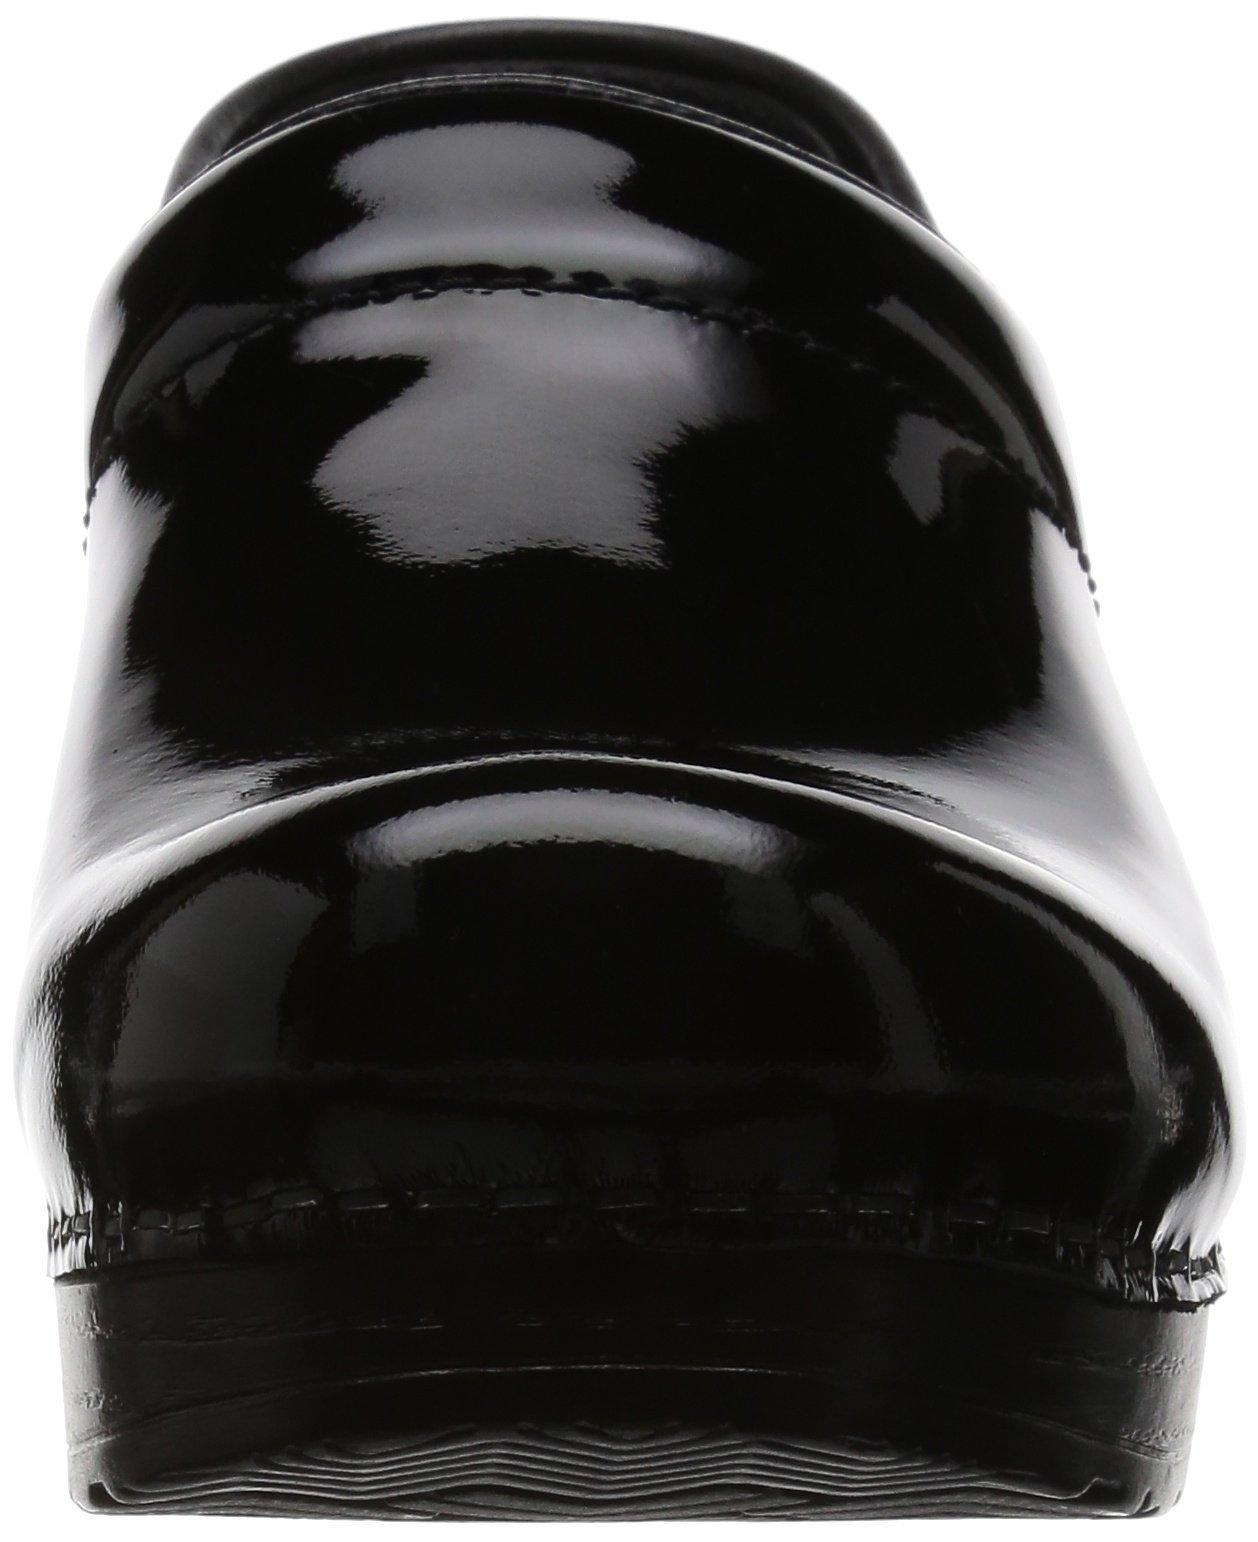 Dansko Women's Professional Patent Leather Clog,Black Patent,37 EU / 6.5-7 B(M) US by Dansko (Image #4)